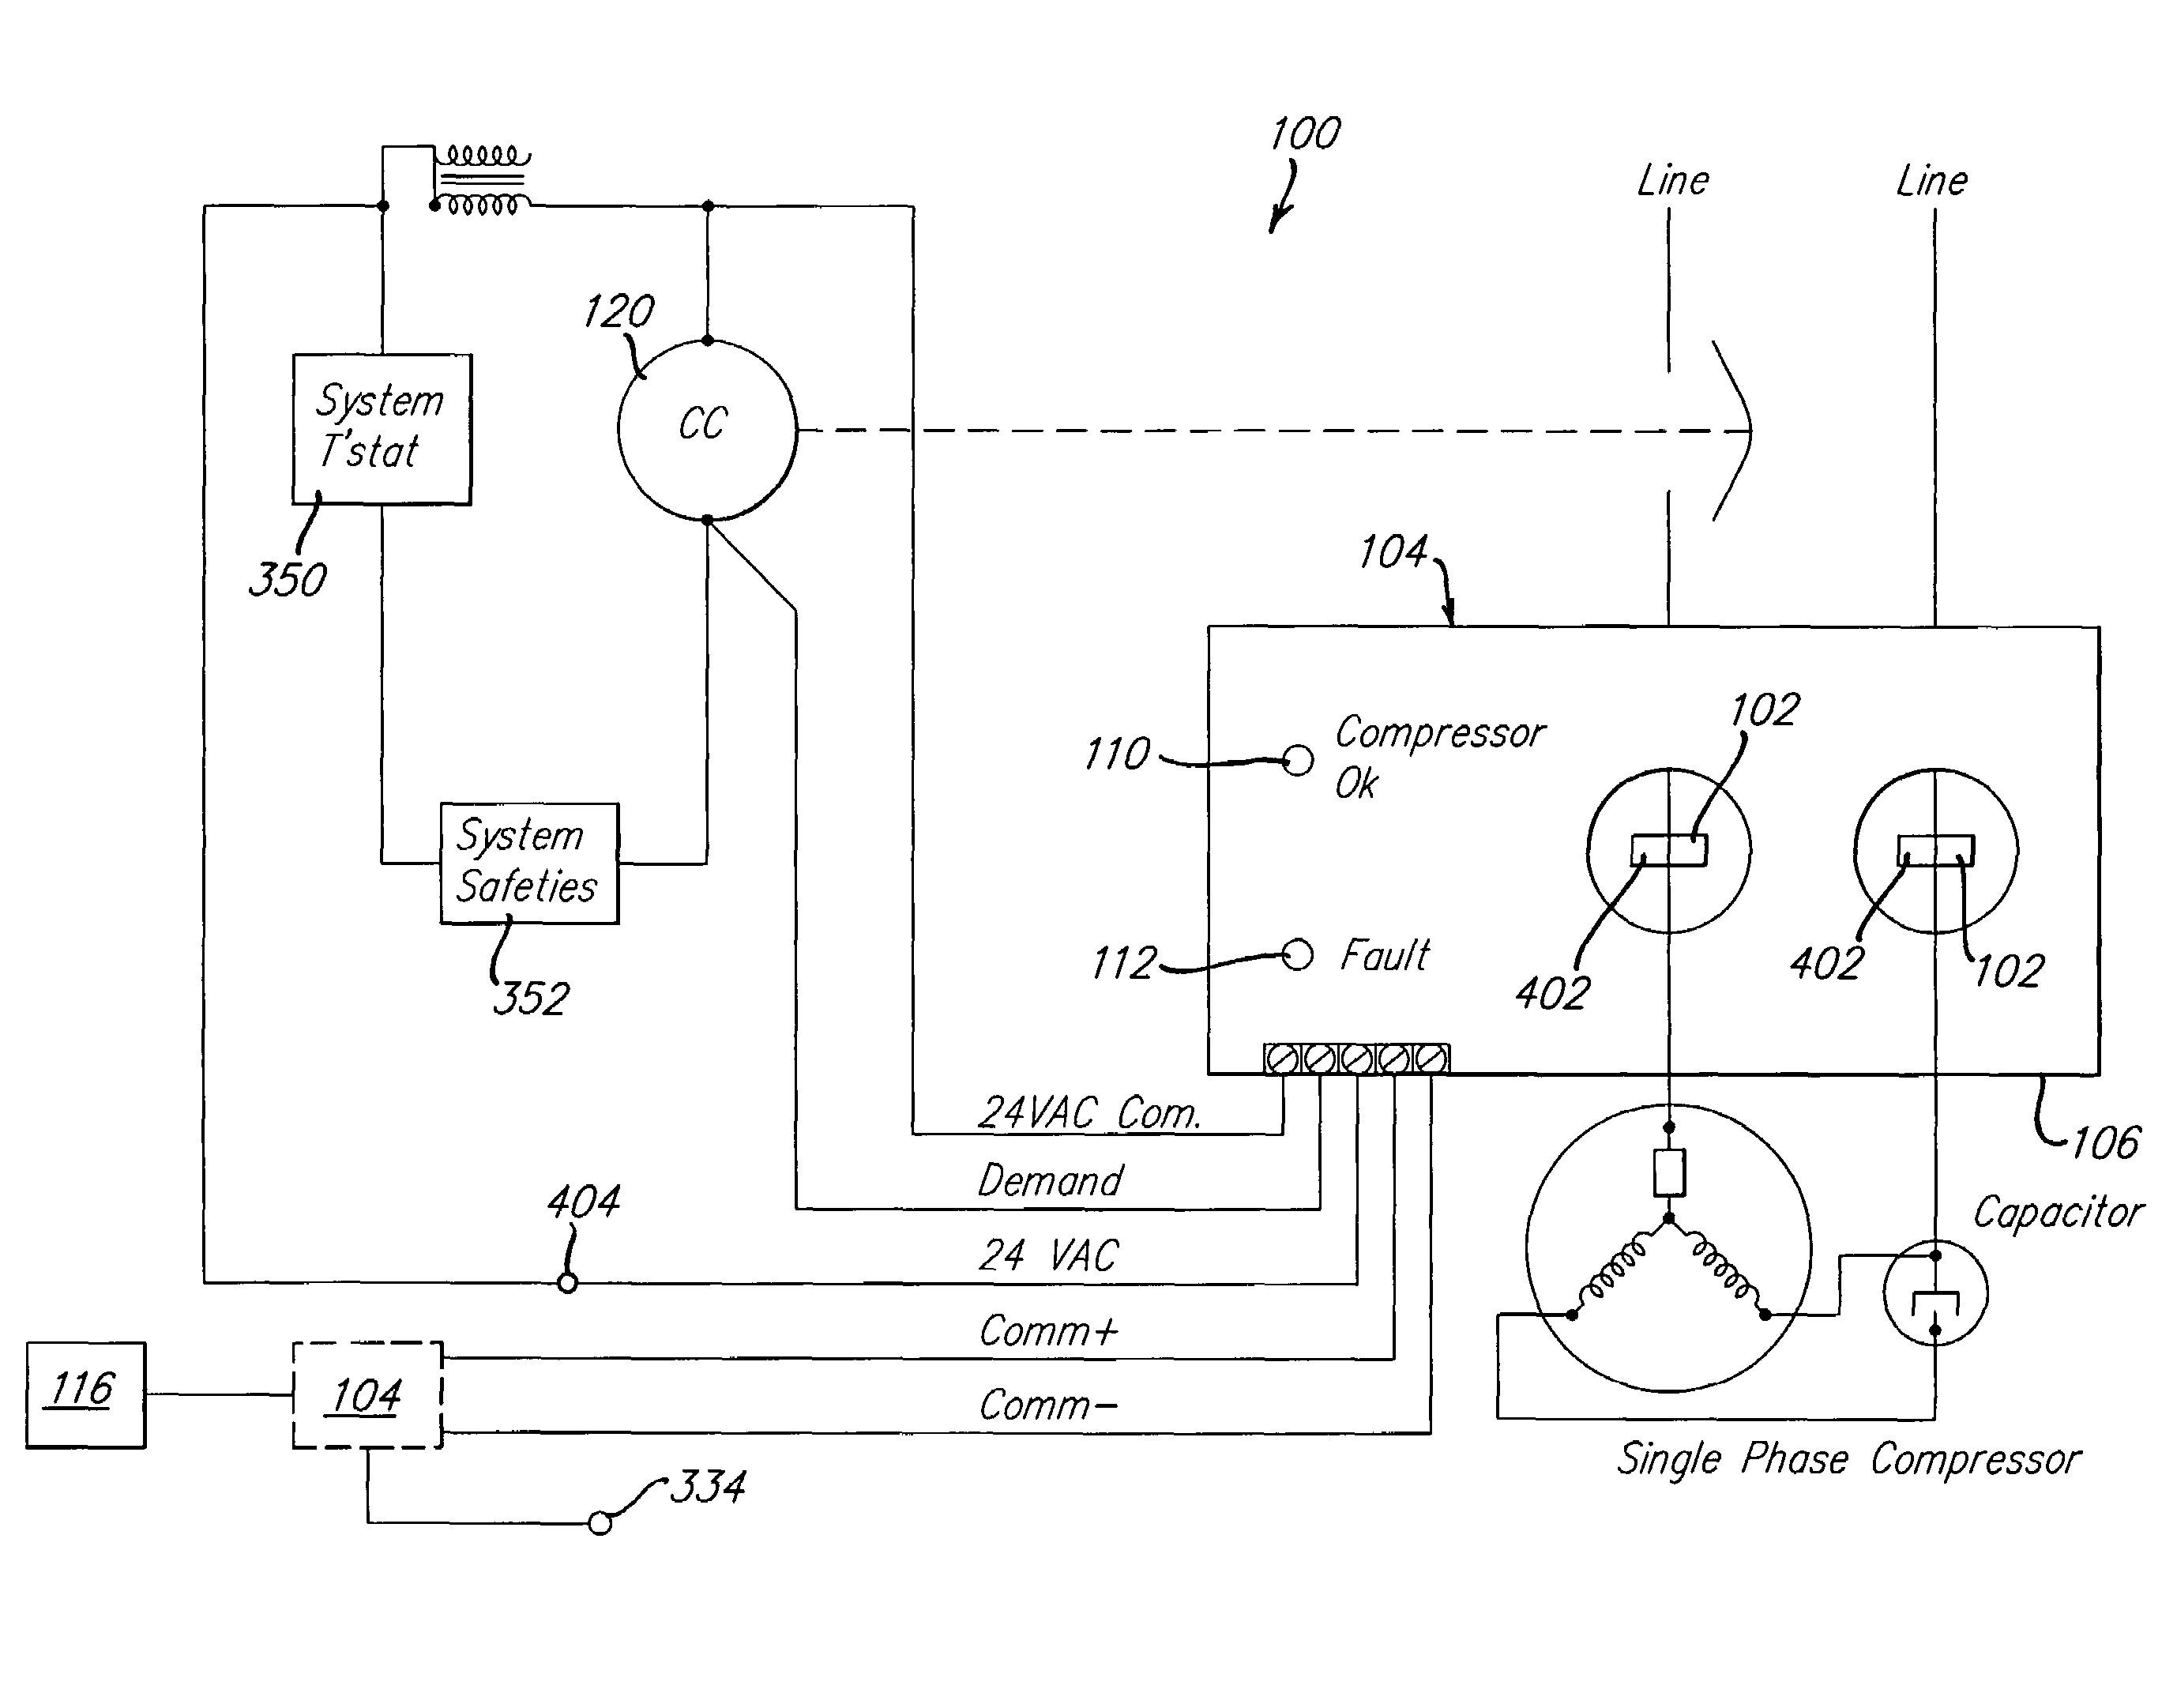 copeland hvac wiring diagram wiring diagram for youa c pressor capacitor wiring diagram older wiring diagram